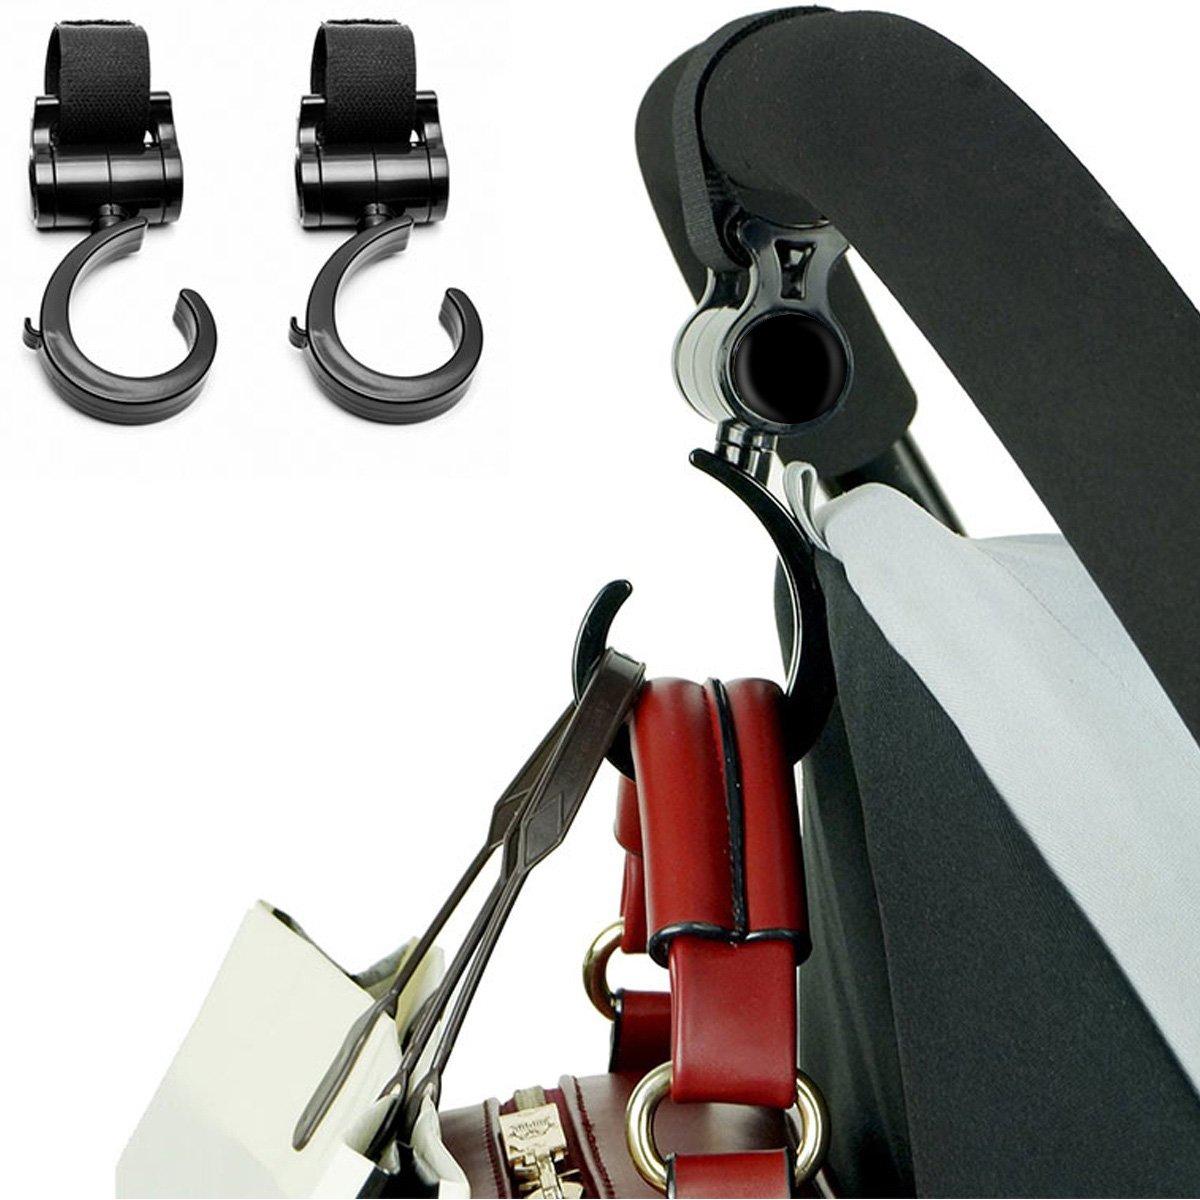 Stroller Hook,Dealgadgets 2 Pack Multi Purpose Hooks Hanger for Baby Diaper Bags, Groceries, Clothing, Purse Black